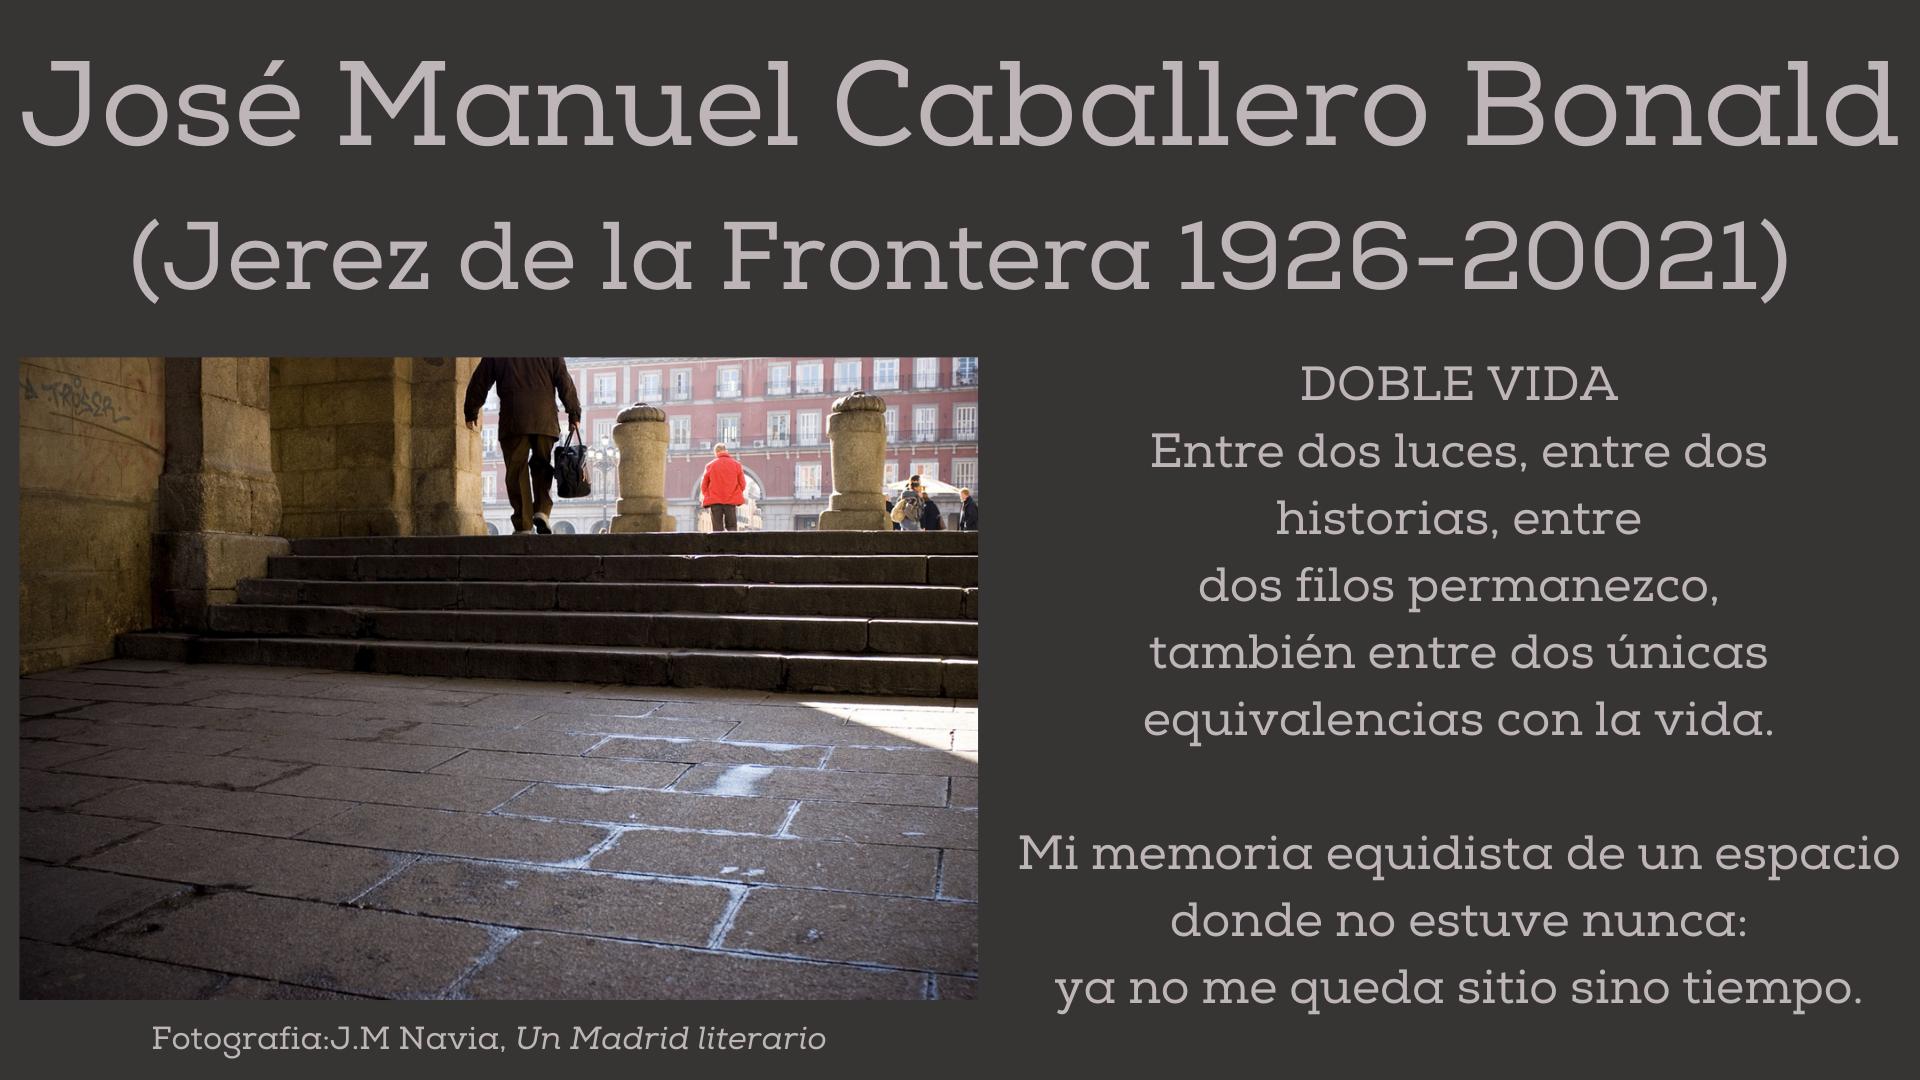 José Manuel Caballero Bonald (Jerez de la Frontera 1926-20021)